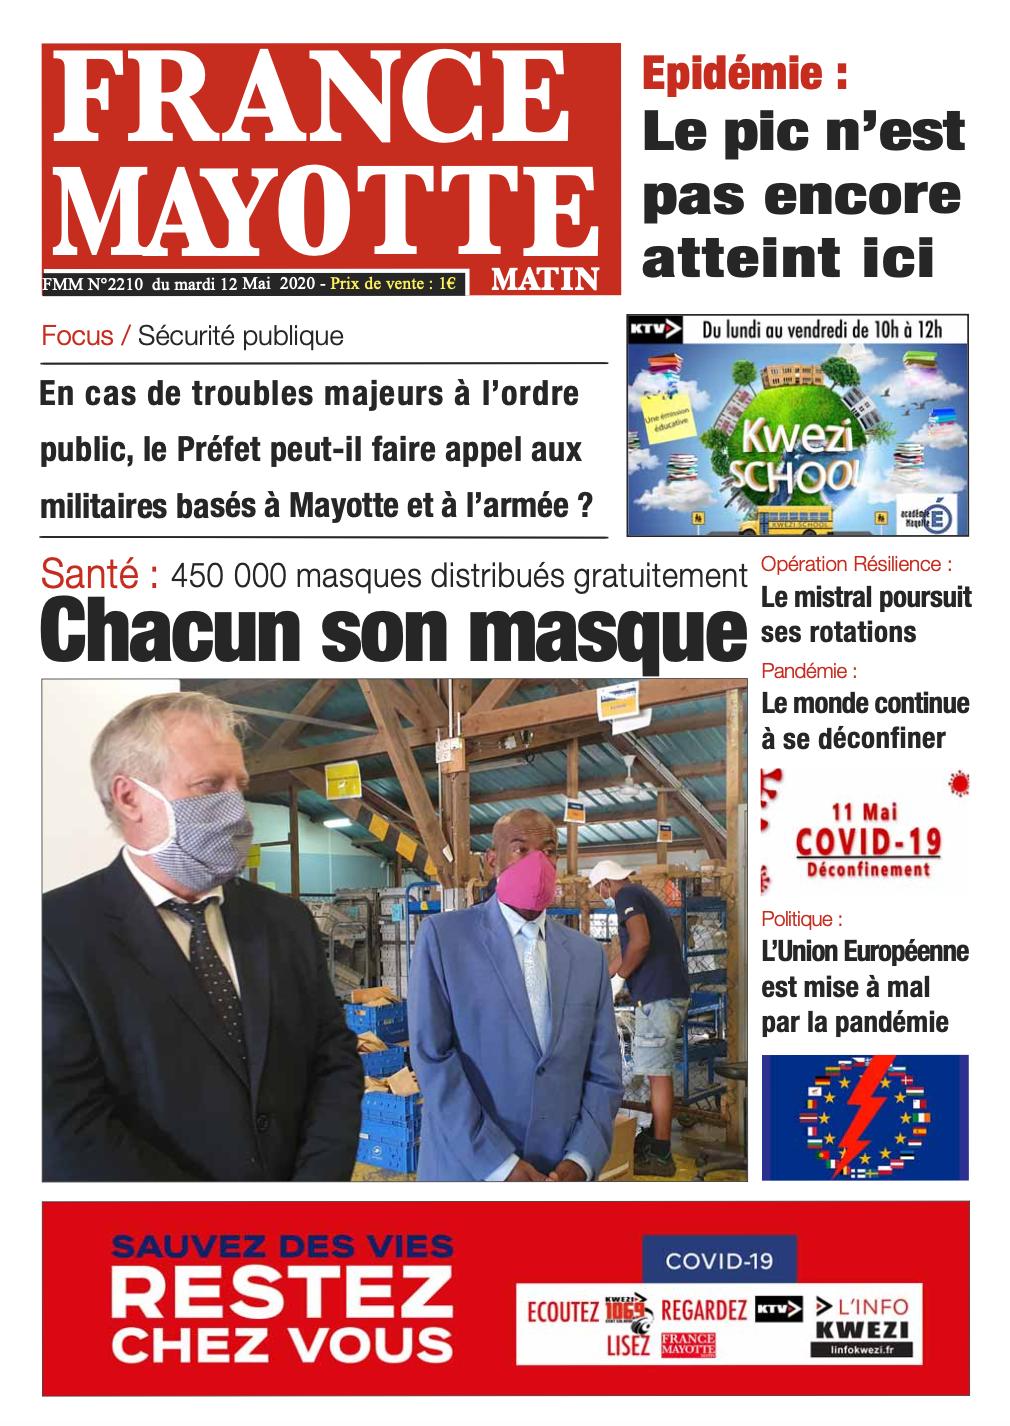 France Mayotte Mardi 12 mai 2020